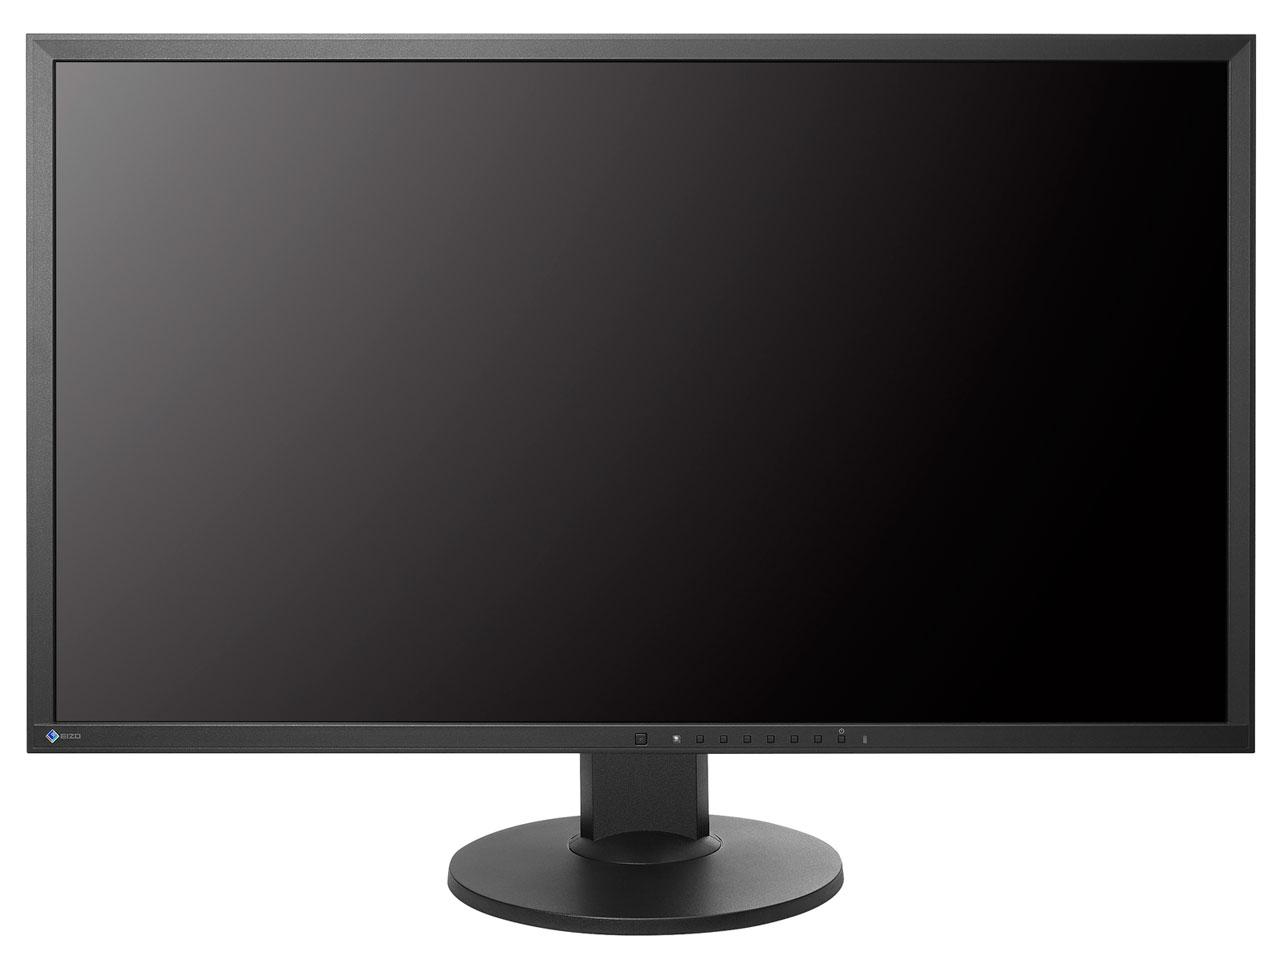 EIZO 31.5型4K液晶ディスプレイ FlexScan EV3237-BK ブラック 【送料無料】【02P03Dec16】